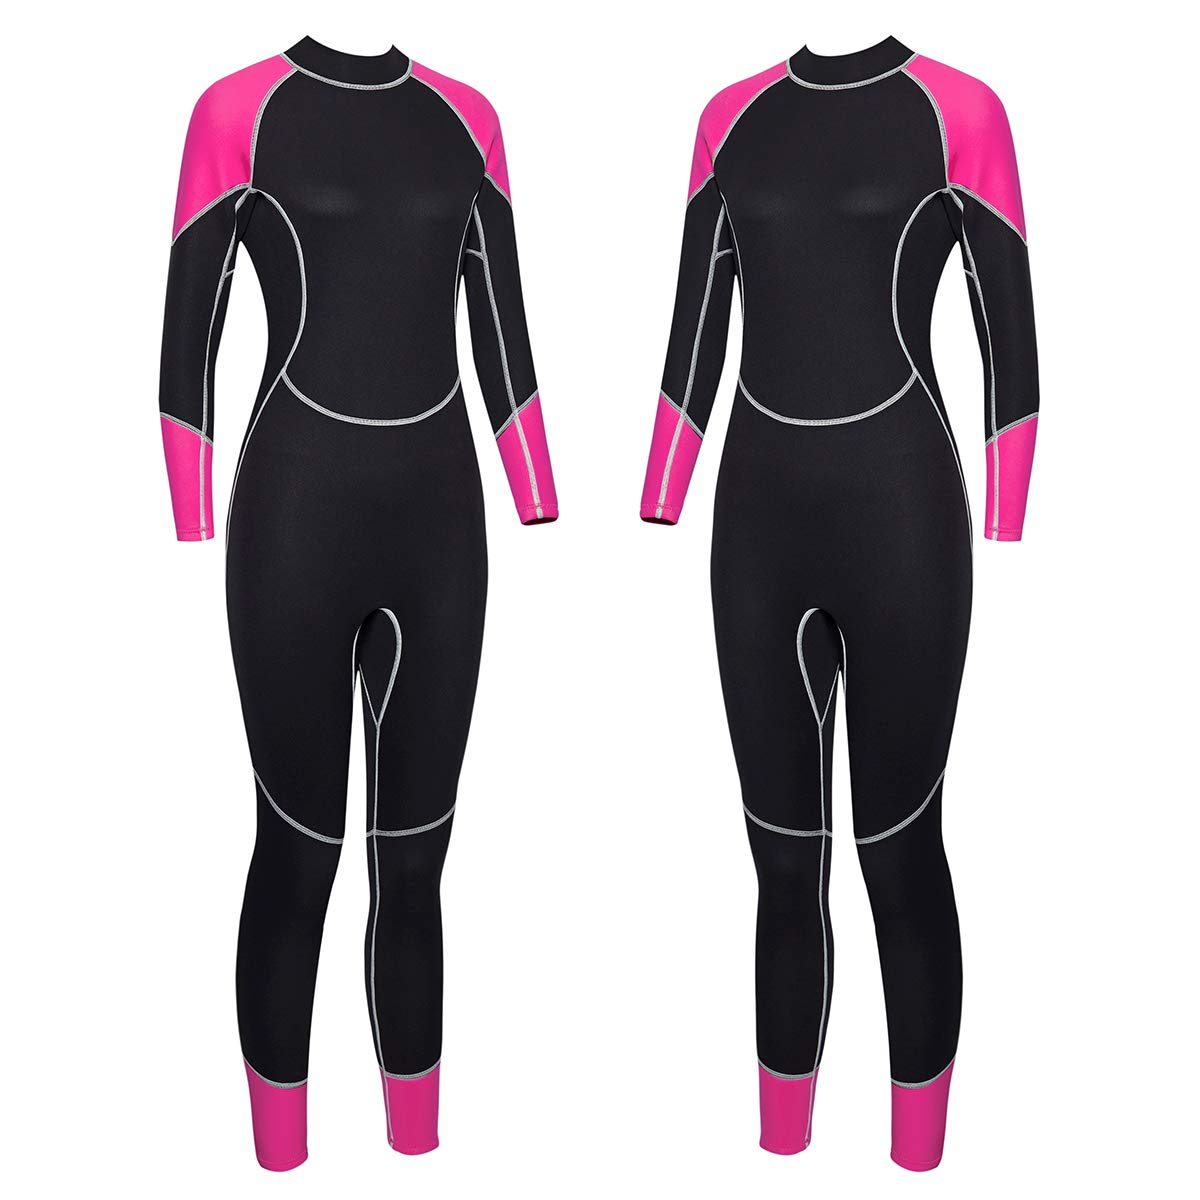 Niiwi Women Full Body Wetsuit - 2.5mm Premium Neoprene Scuba Diving Suit for Water Activities (Pink/Black, XL) by Niiwi